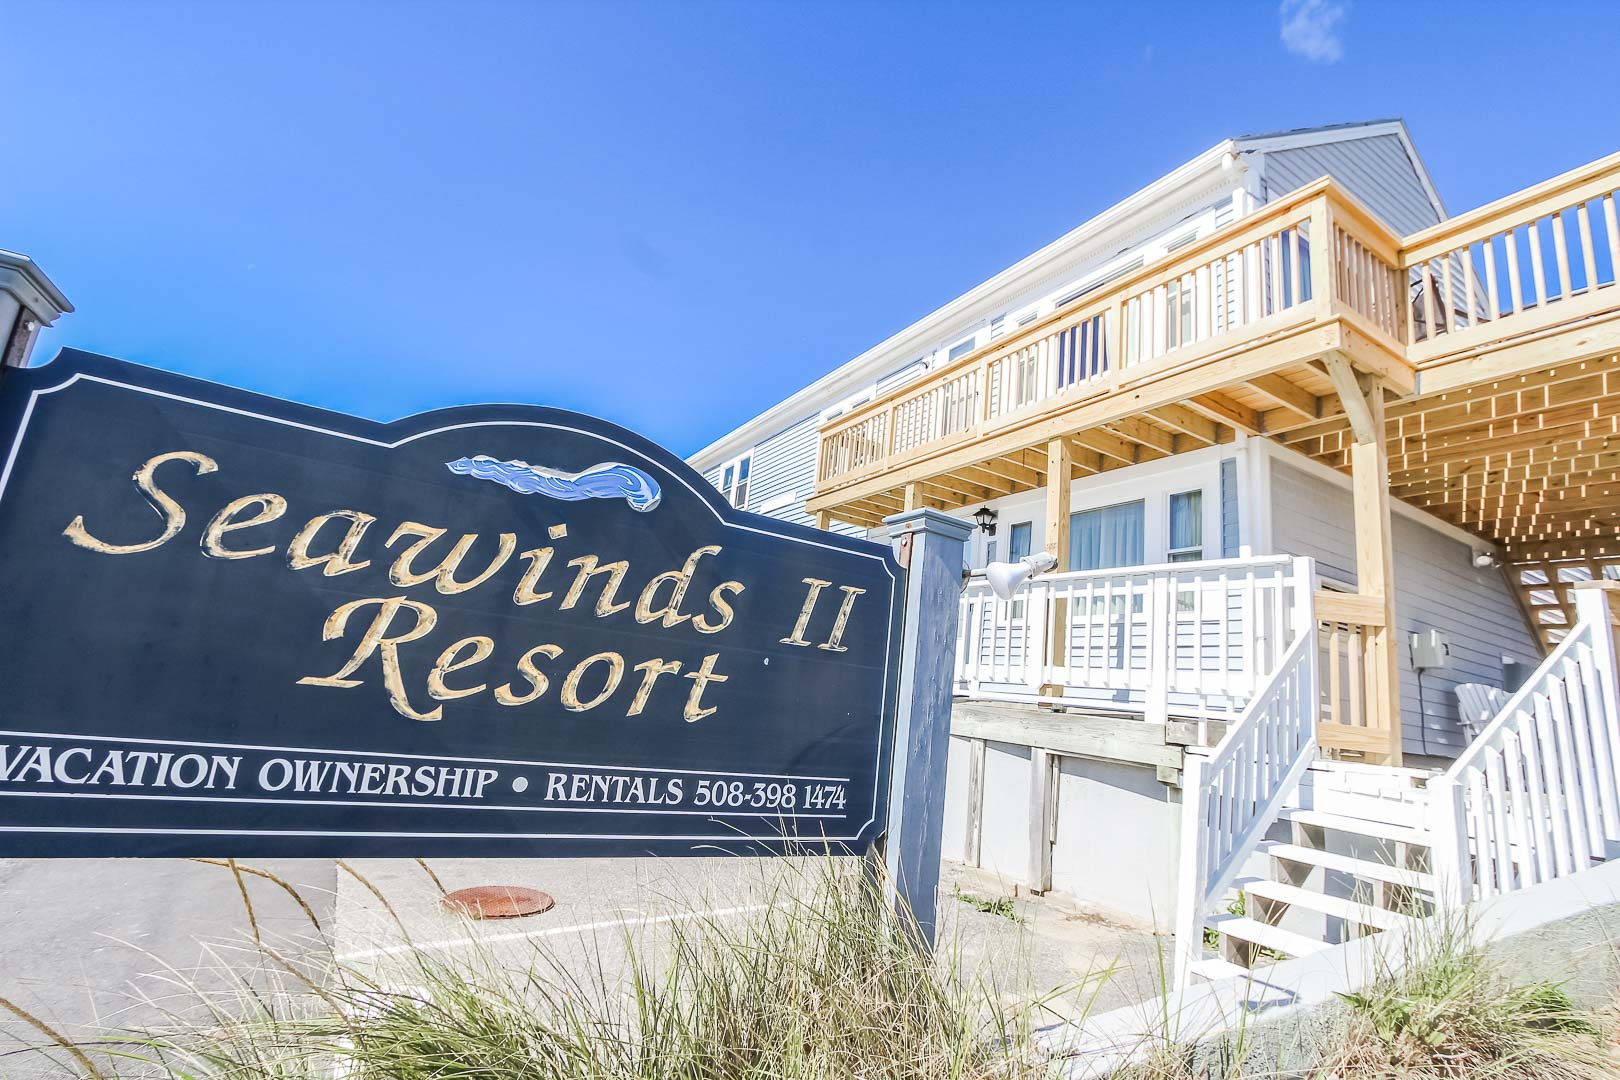 A welcoming resort entrance at VRI's Seawinds II Resort in Massachusetts.